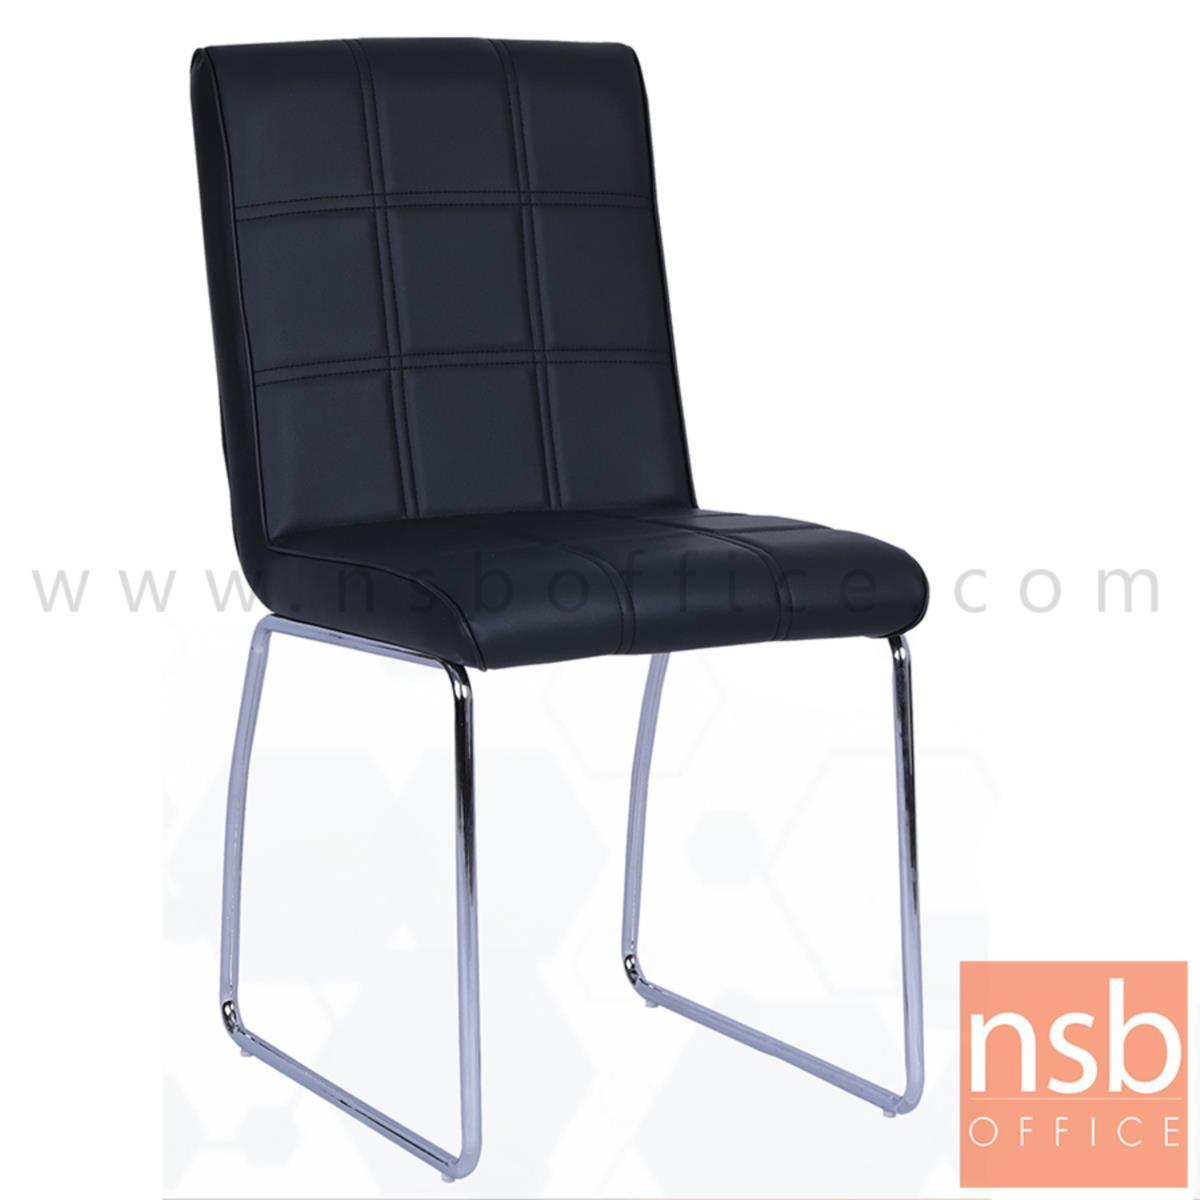 B04A194:เก้าอี้รับแขกตัวยูหุ้มหนัง รุ่น Houghton (ฮอตัน)  ขาเหล็กชุบโครเมี่ยม